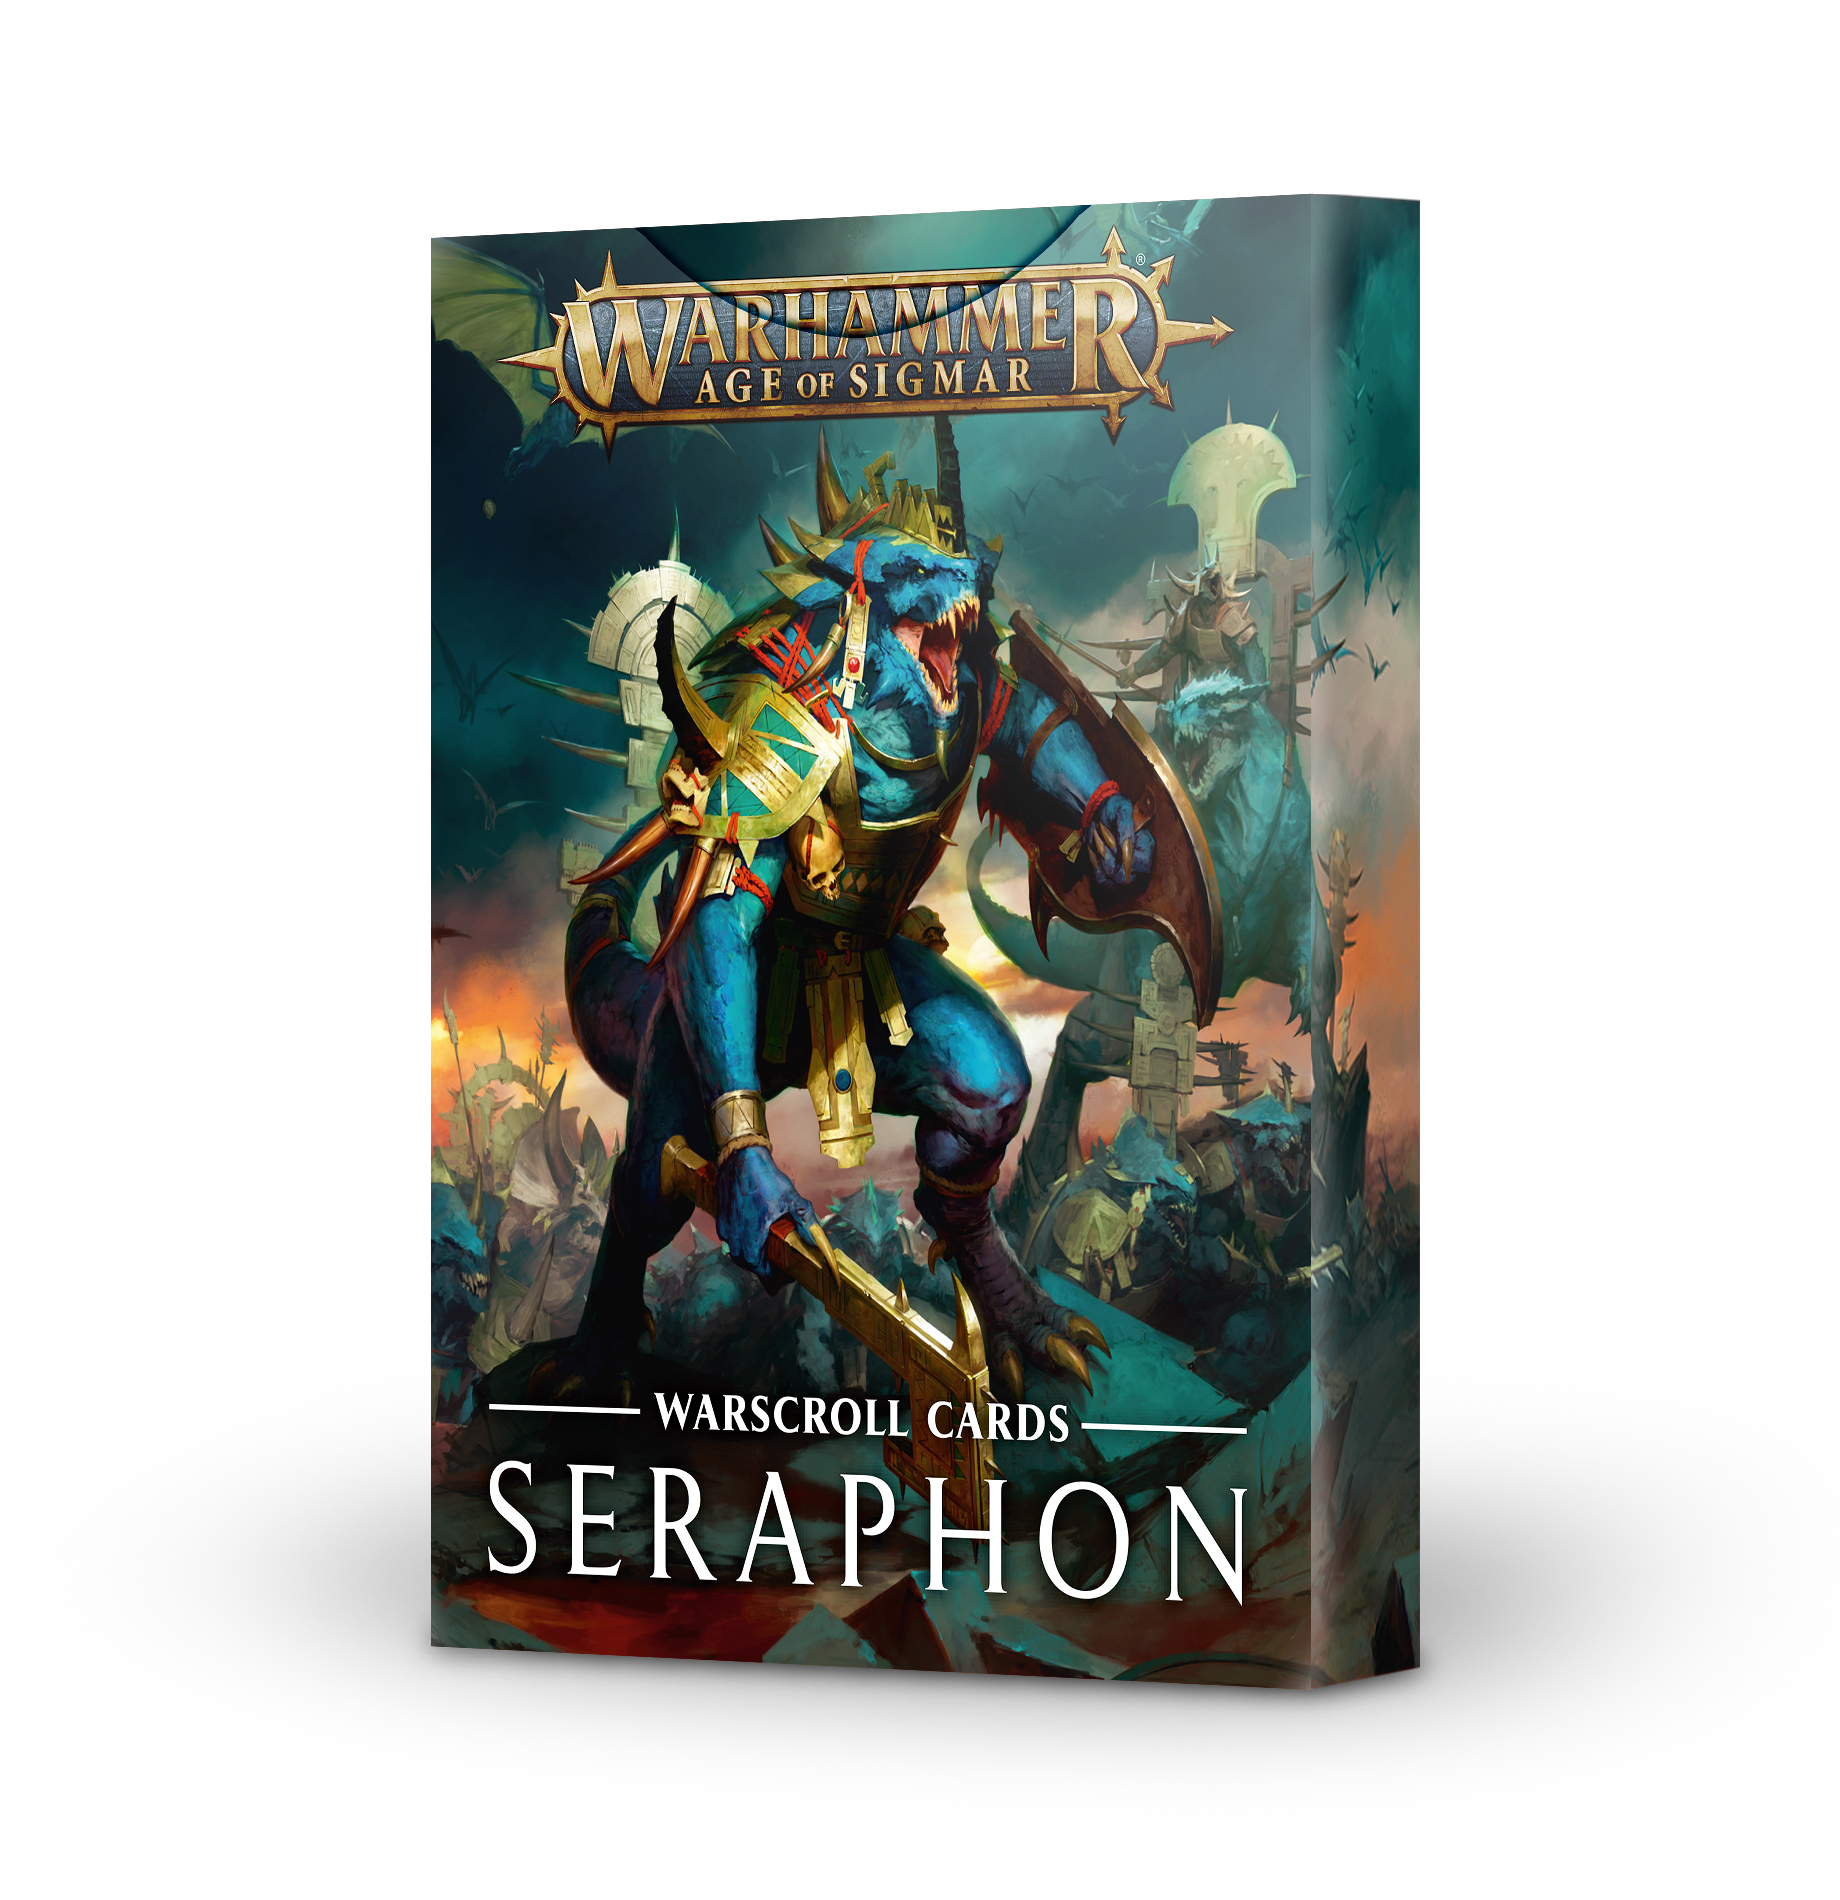 Seraphon, Warscroll Cards